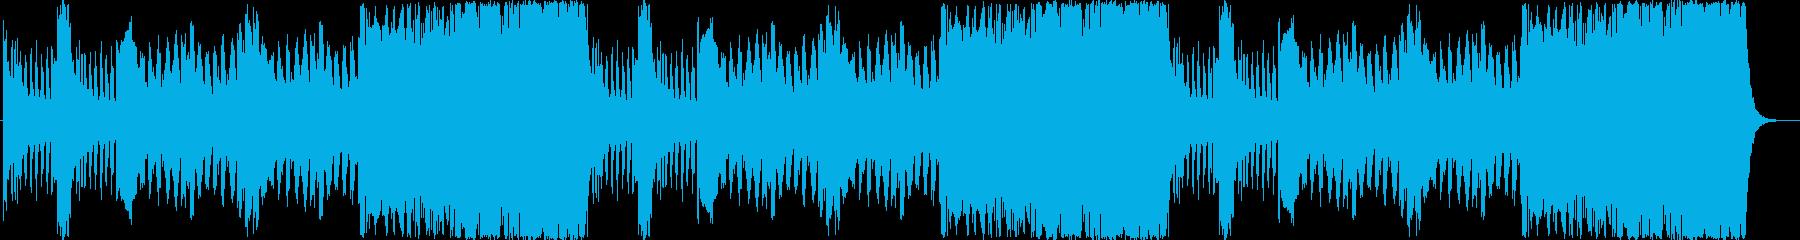 RPG トップ画面用BGM・30秒ループの再生済みの波形